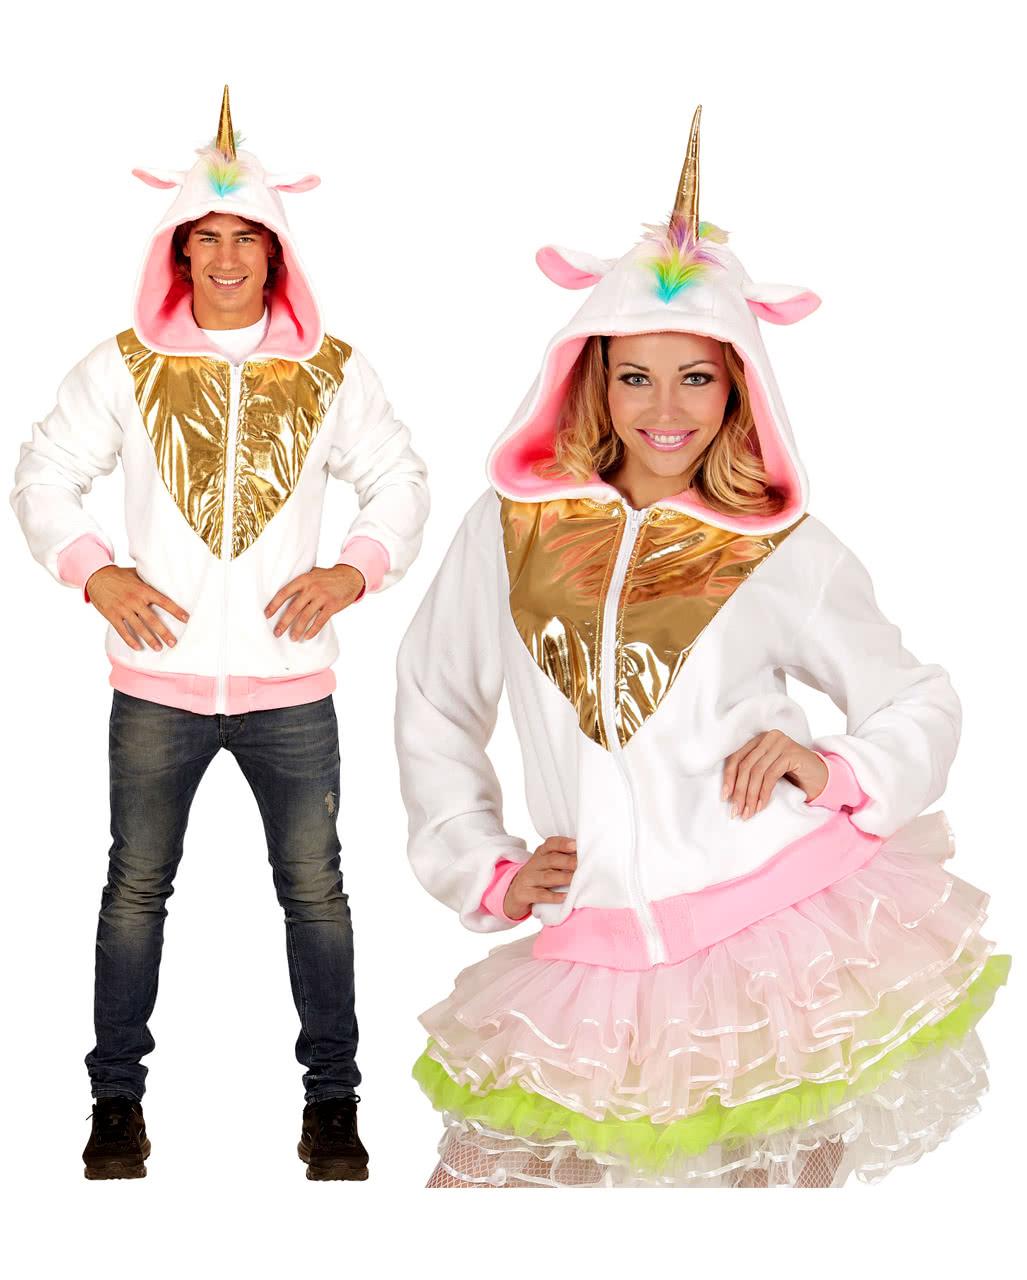 Voll Im Trend Einhorn Kostume Fur Fasching Karneval